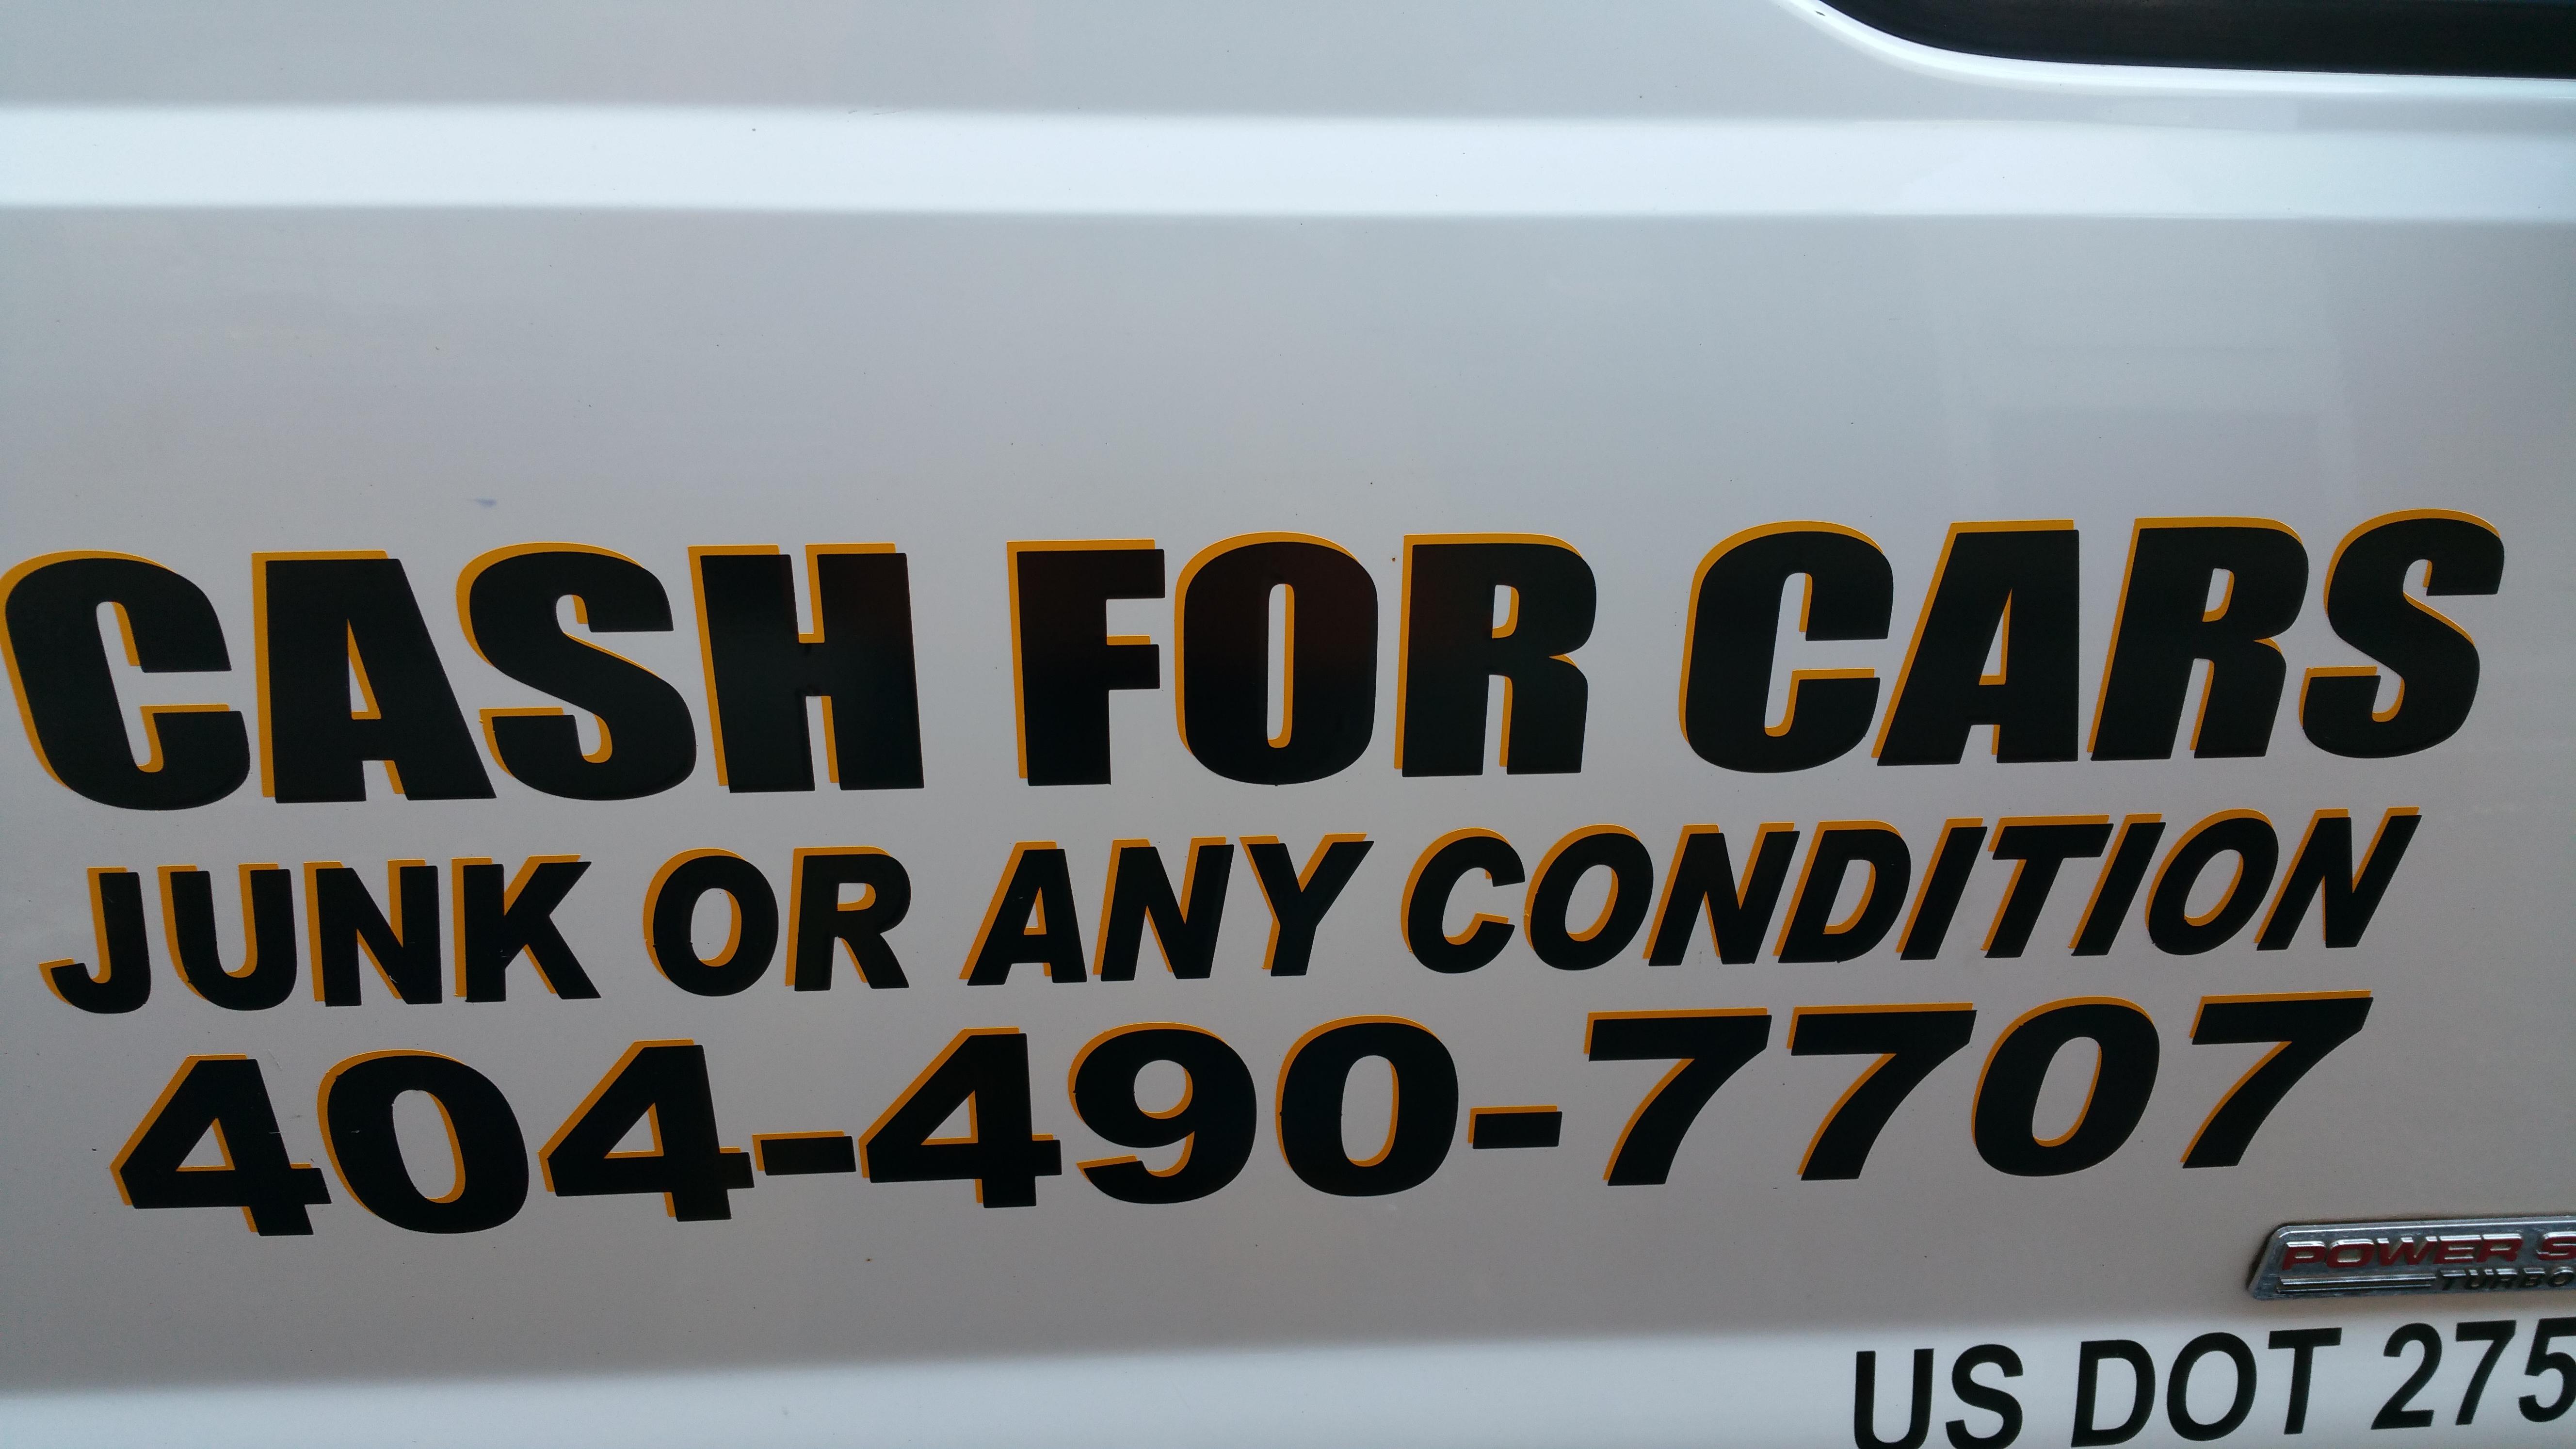 Pleasant Cash For Junk Cars image 1